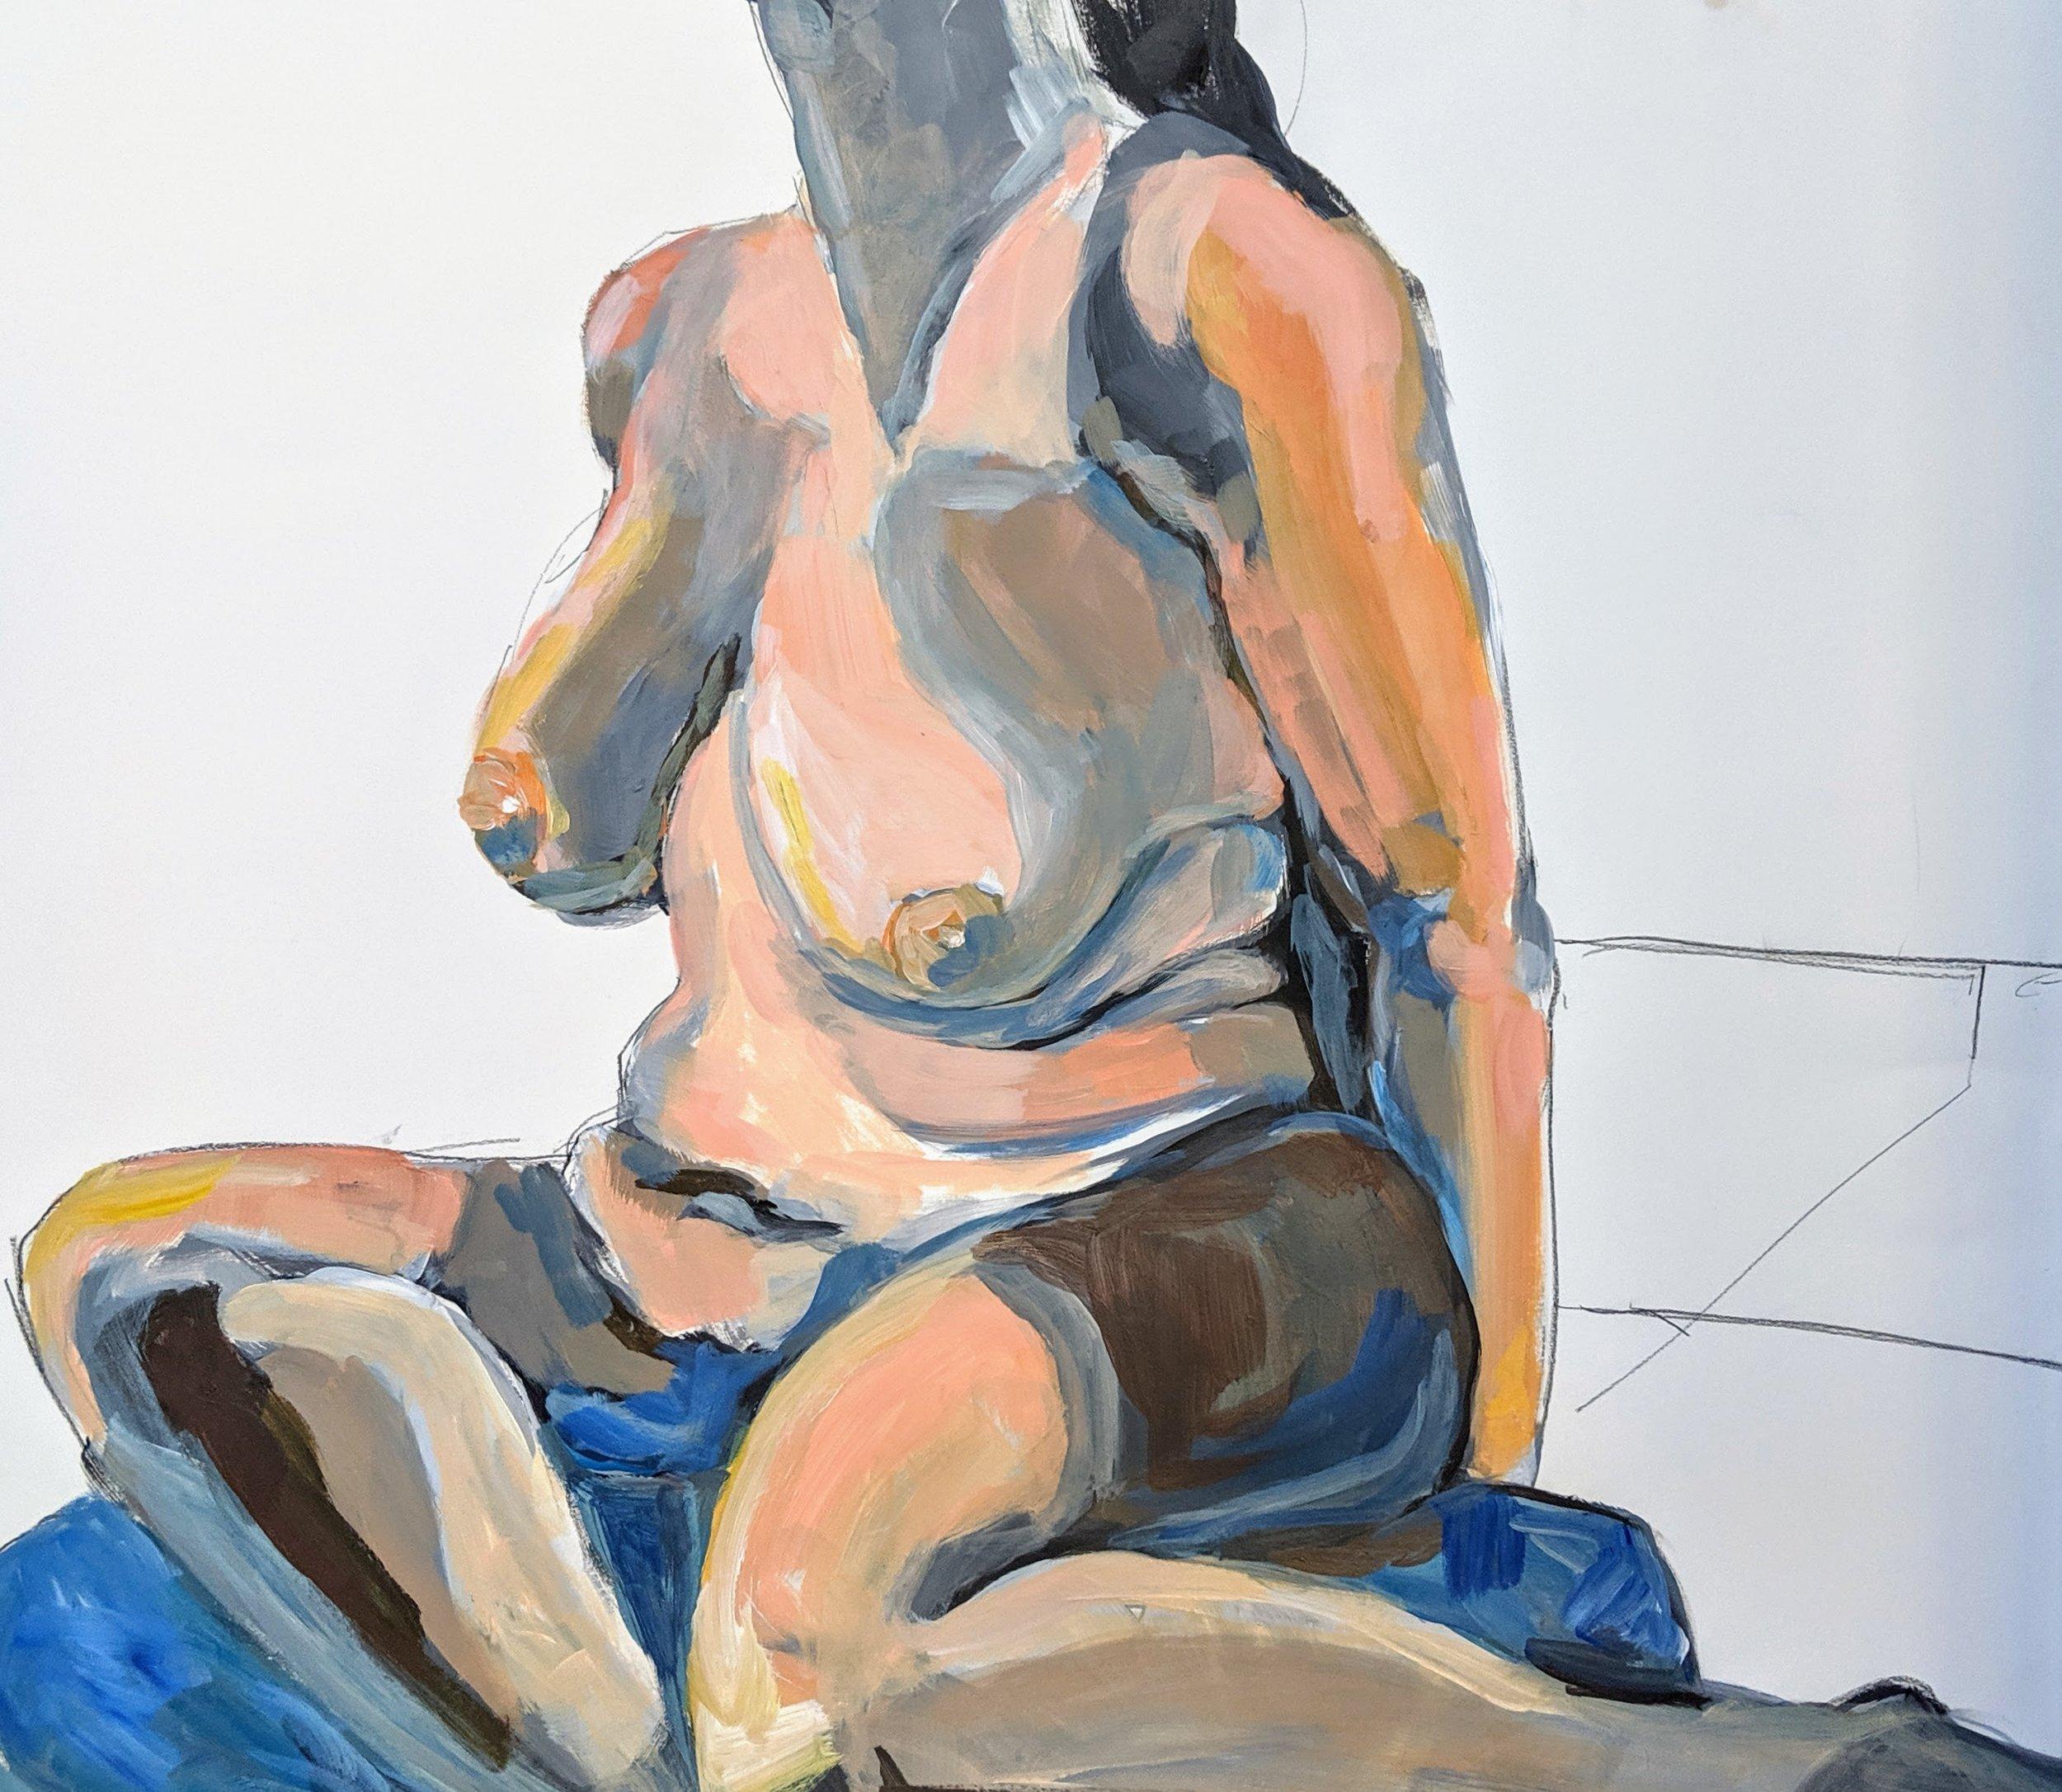 ©2019 Lori Wise | Figure Painting & Drawing Workshop, San Luis Obispo County (Arroyo Grande, CA) | David Limrite, Instructor